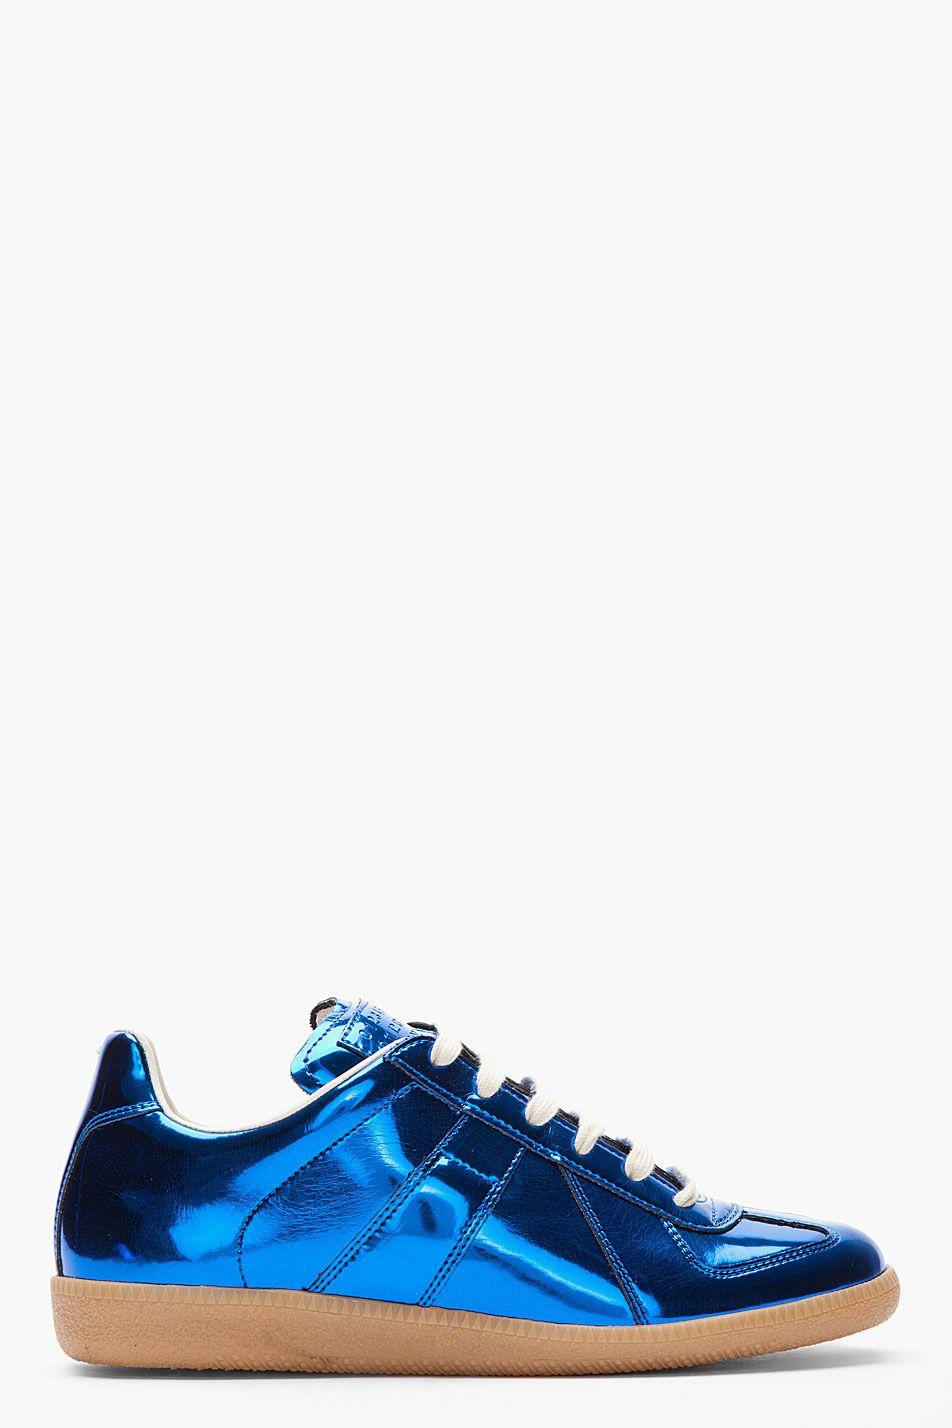 Replica Rubber And Mesh Sneakers - BlackMaison Martin Margiela h2Qhf4ix2k